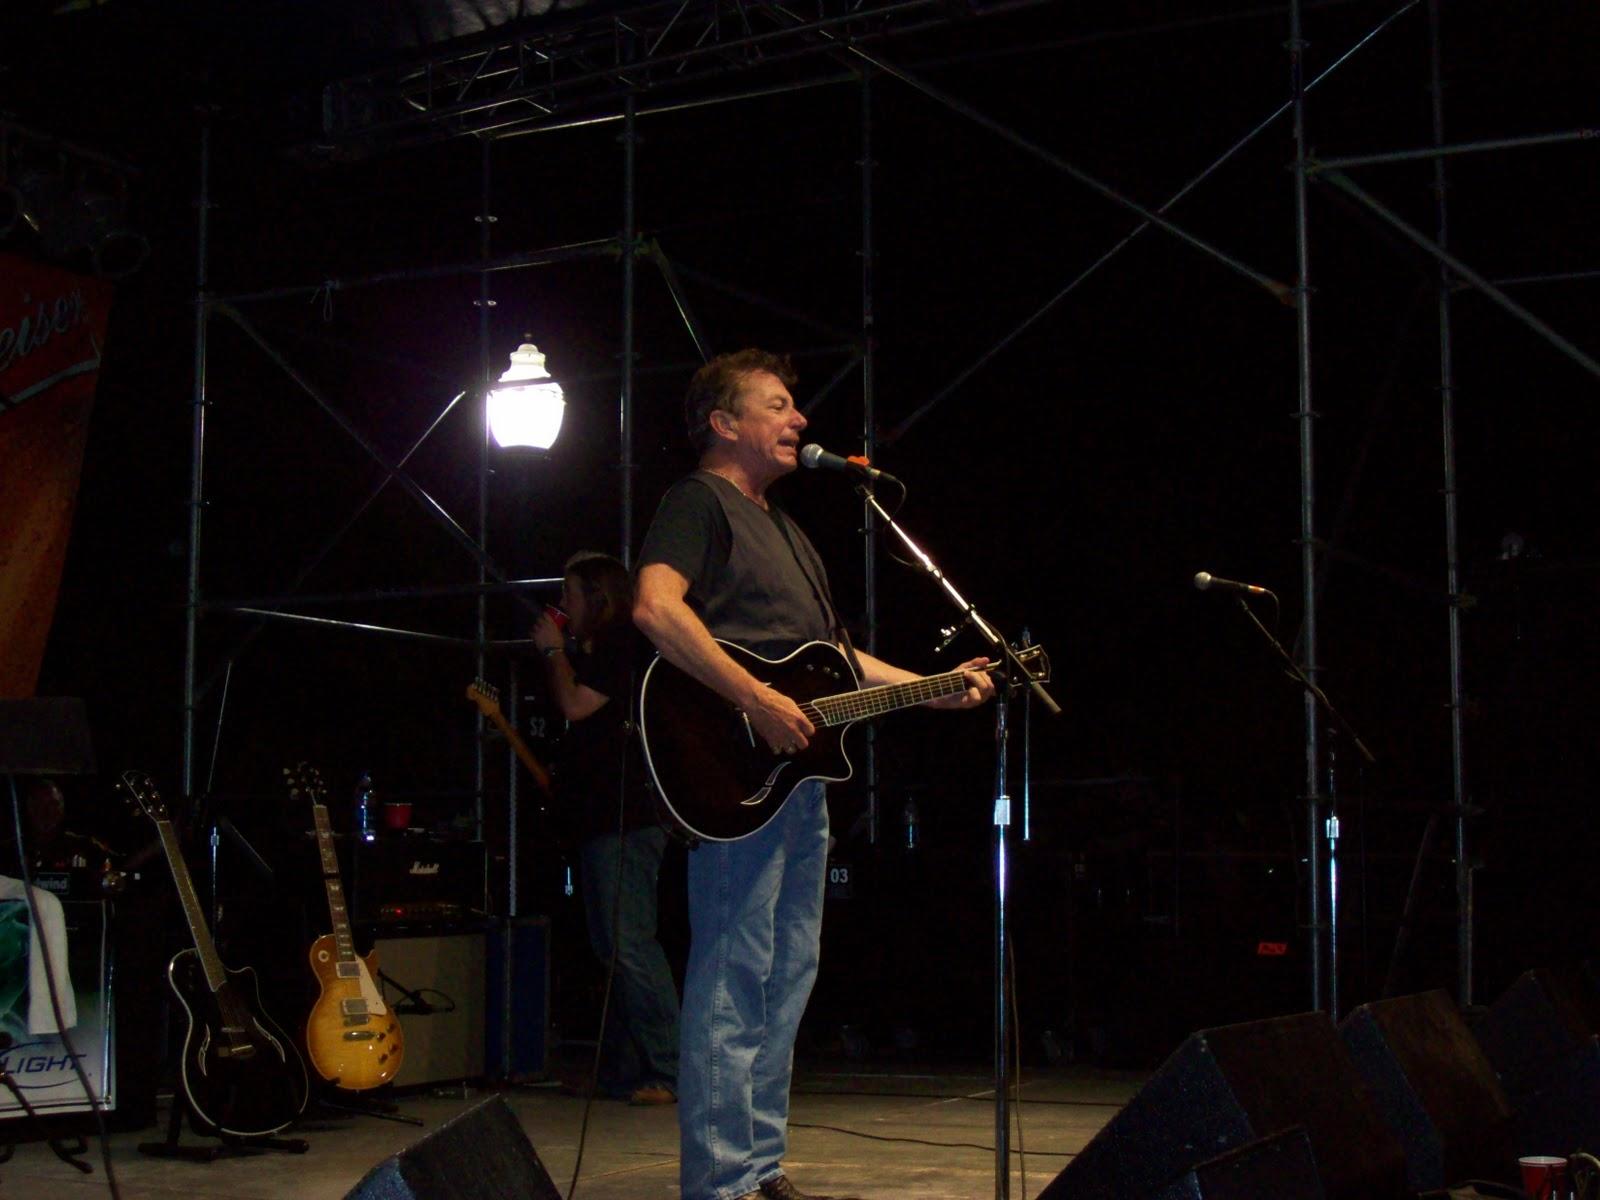 Conroe Cajun Catfish Festival - 101_0605.JPG